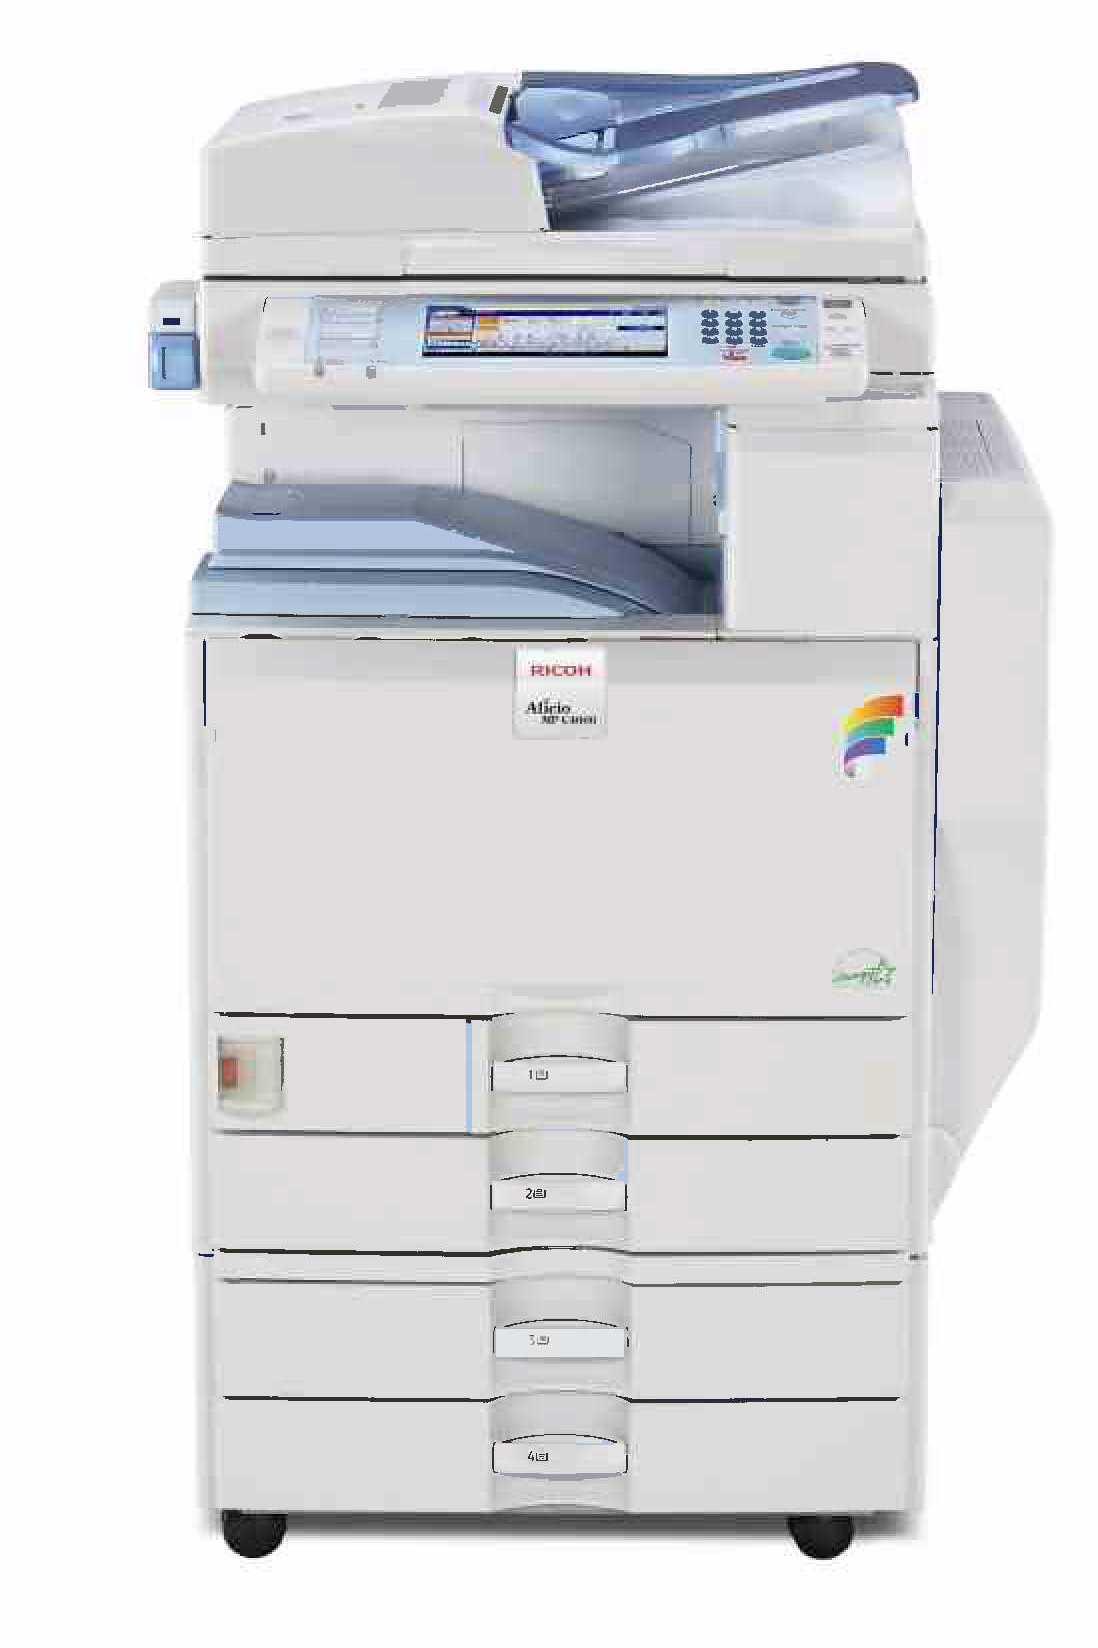 Ricoh Aficio MP-3300